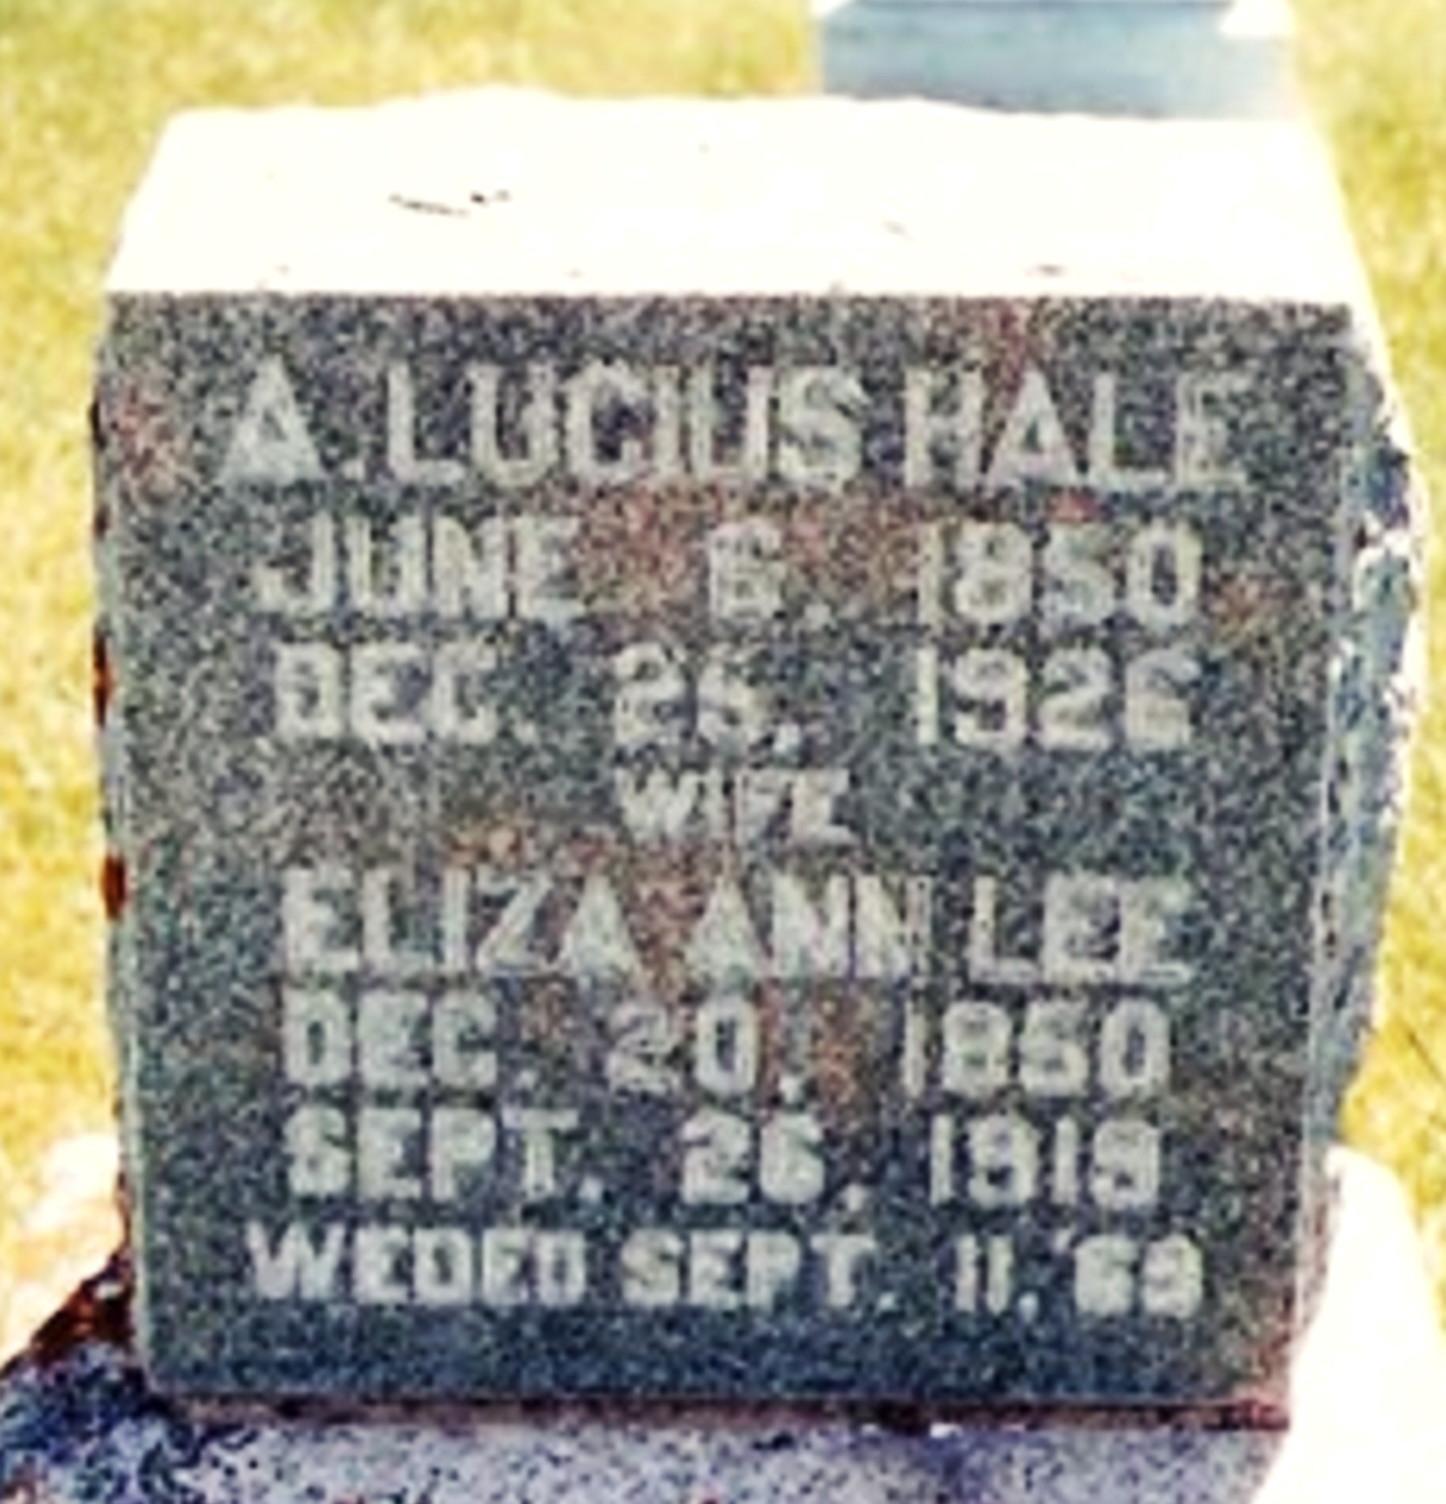 Aroet Lucius Hale